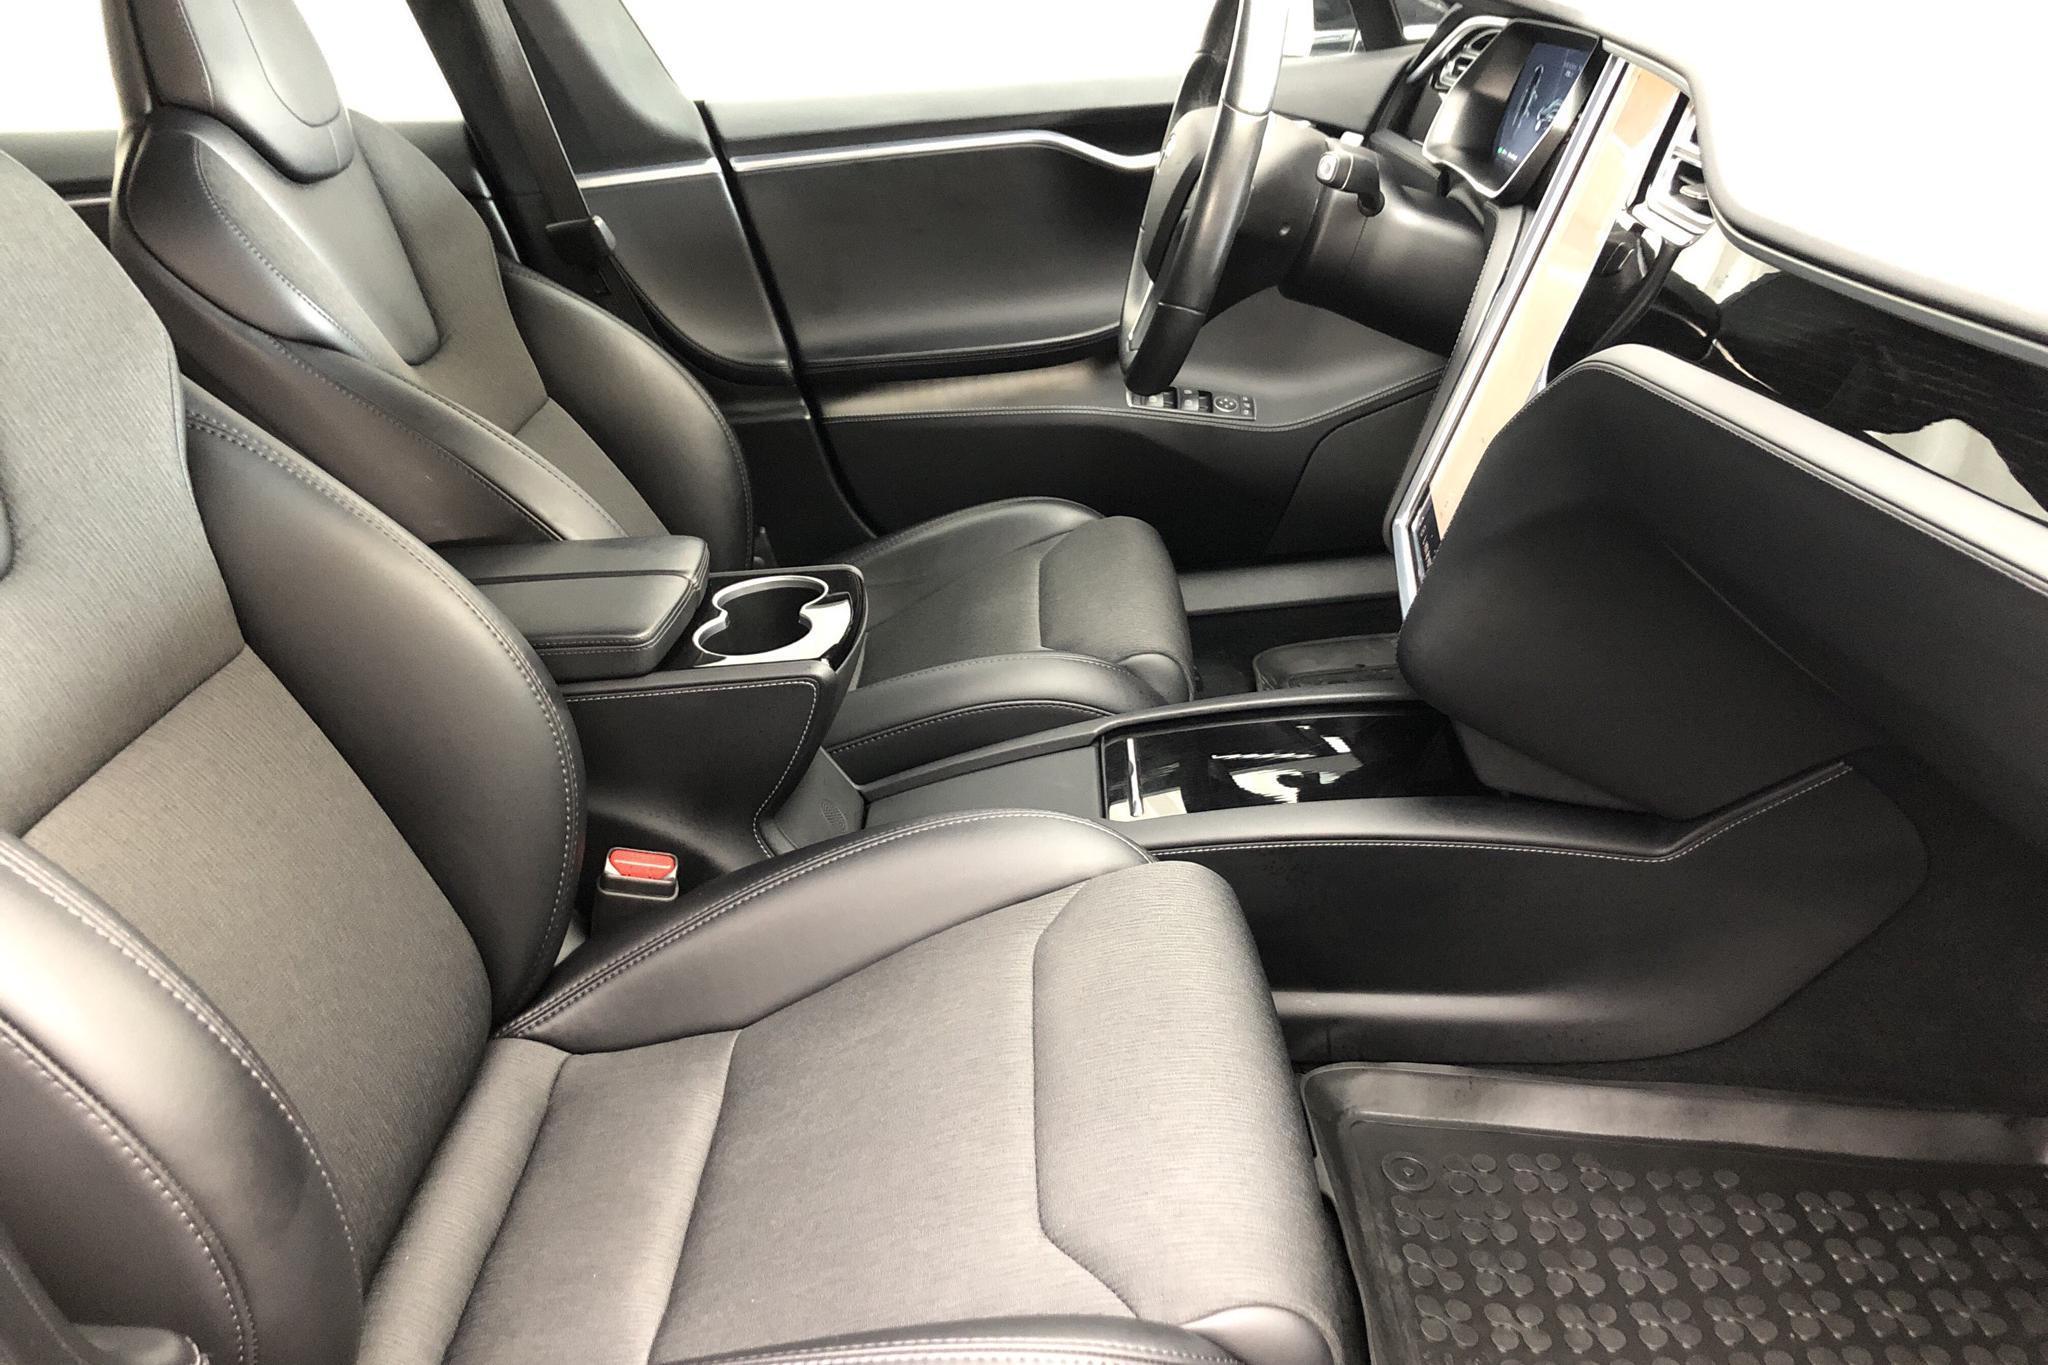 Tesla Model S 75D (525hk) - 6 913 mil - Automat - svart - 2018